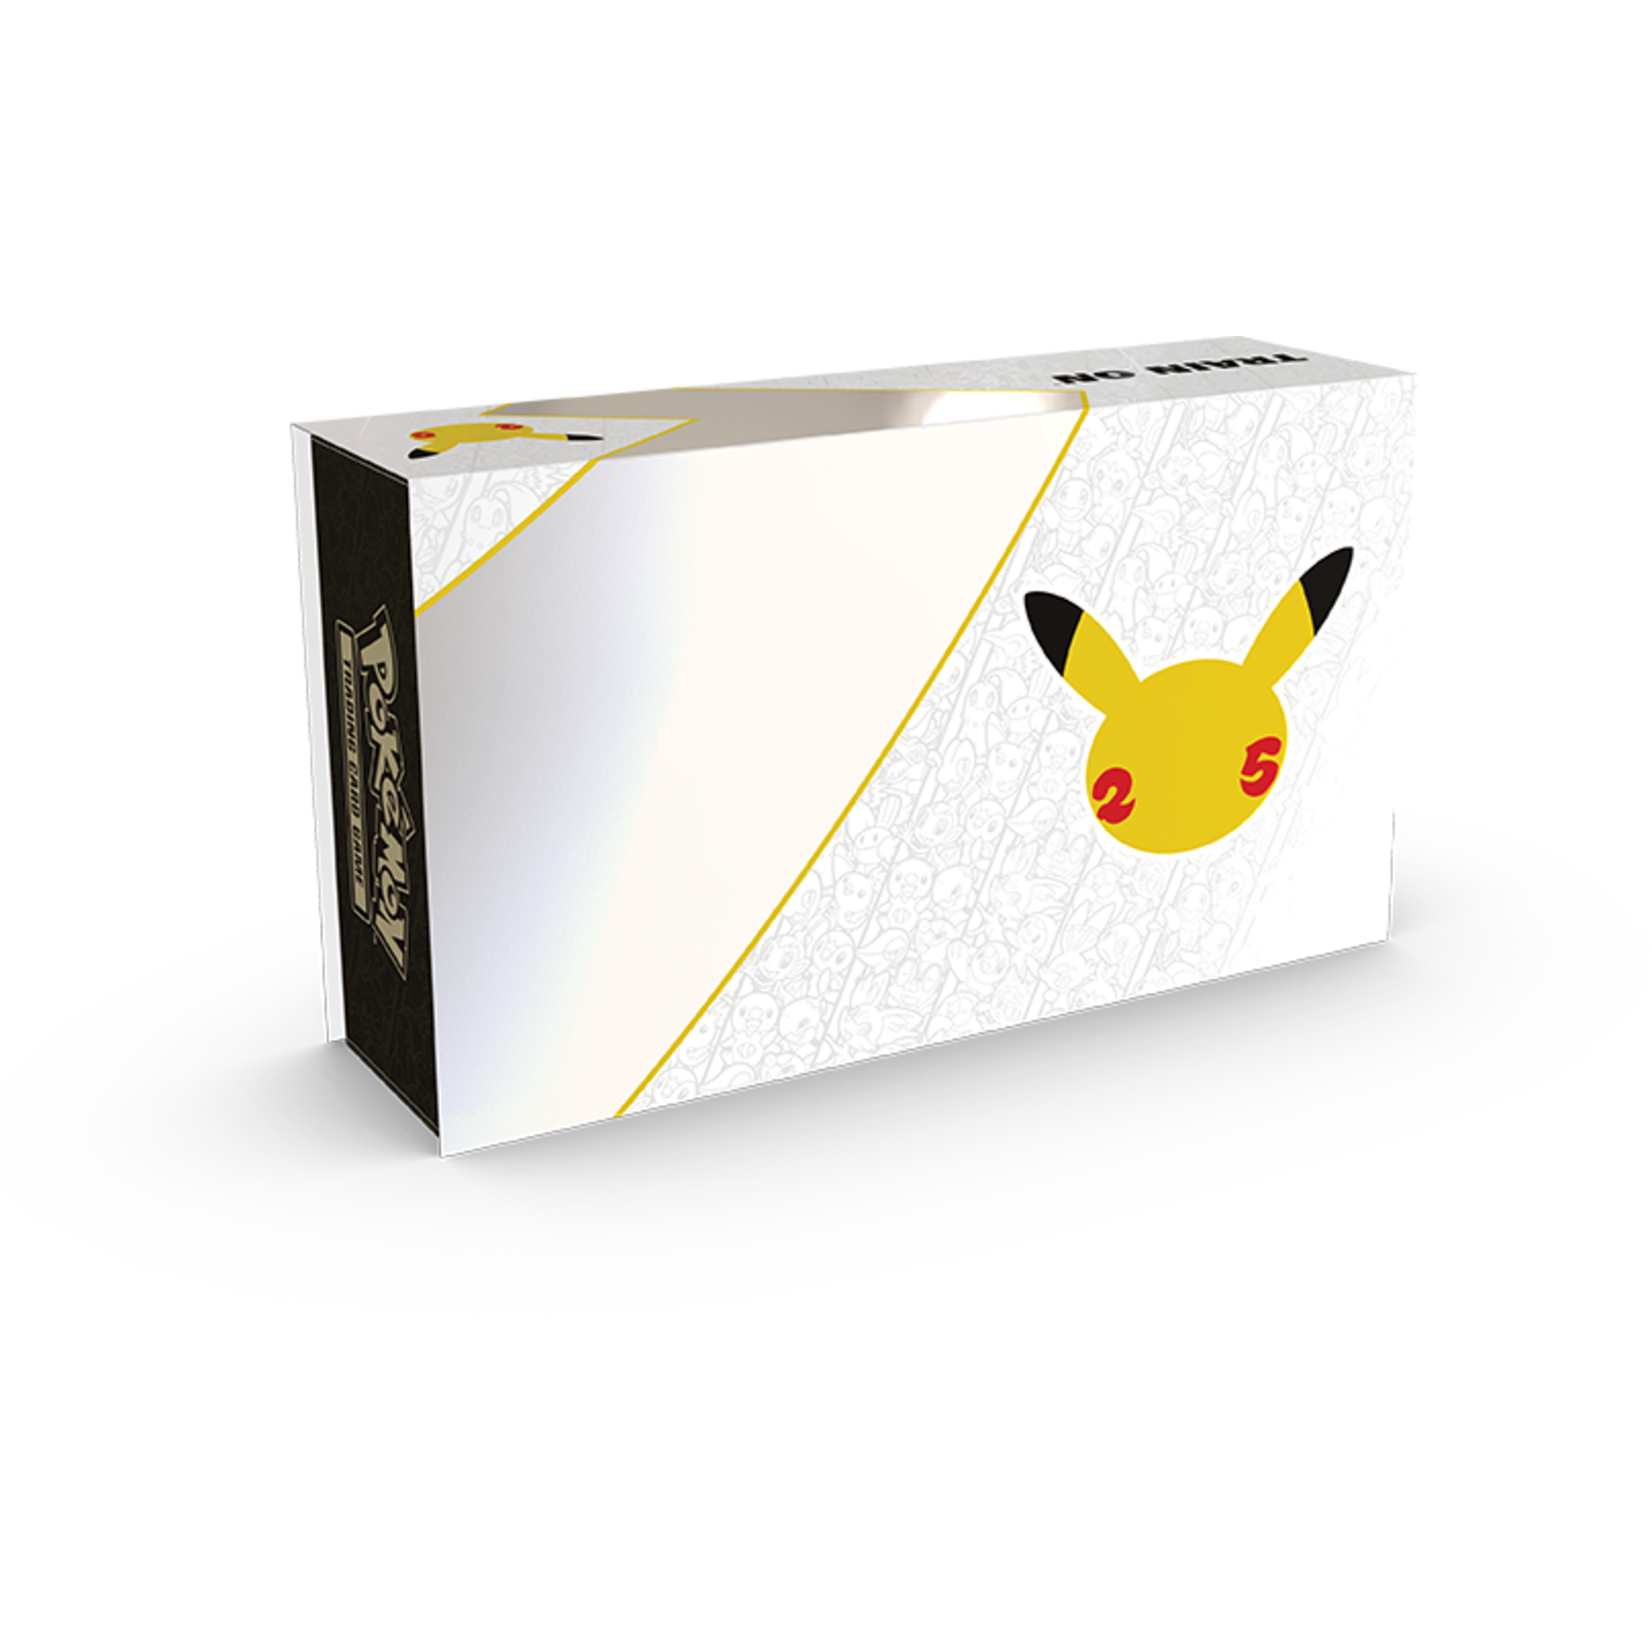 Pokémon Pokémon TCG: Celebrations Ultra Premium Collection